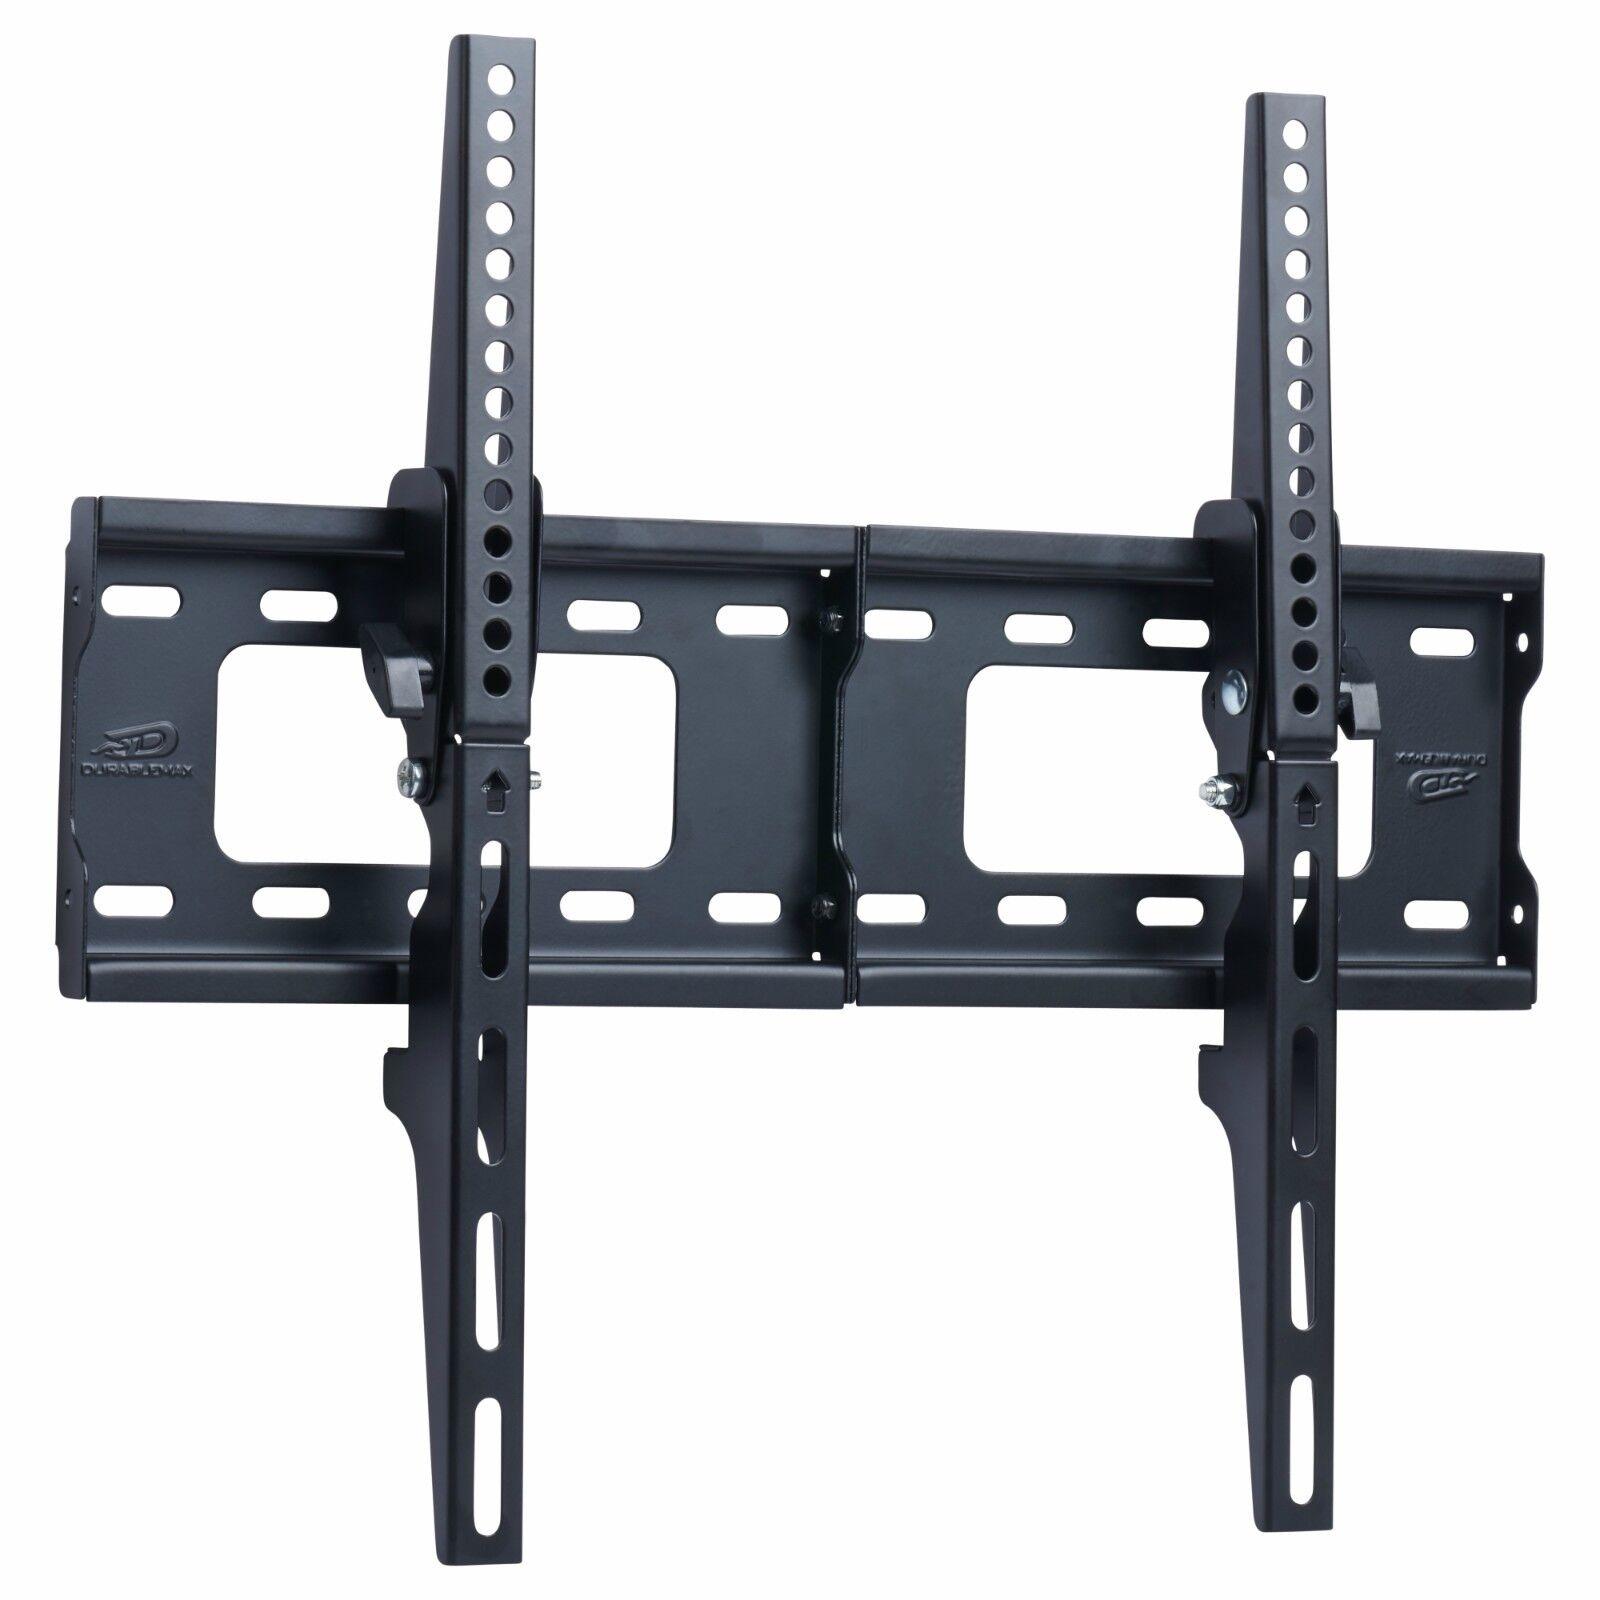 TV Wall Mount Bracket Flat 15° Tilt Swivel For 32 40 42 46 50 52 55 60 65 Inch